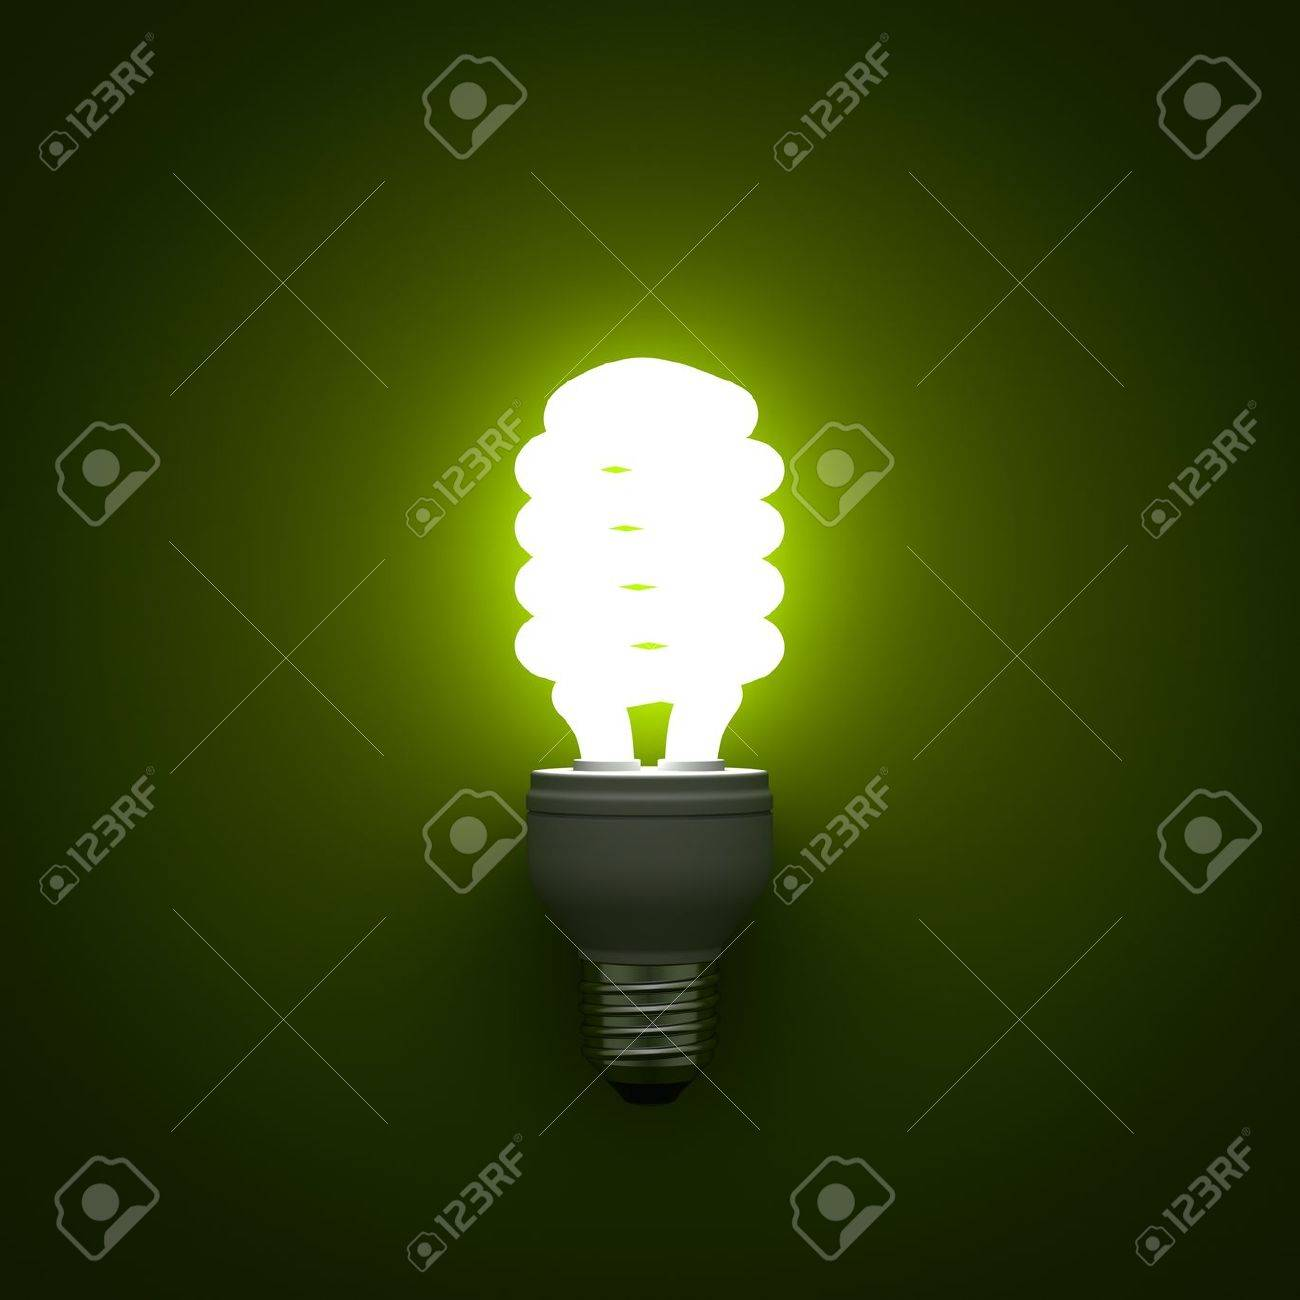 cfl energy saving compact fluorescent light bulb glowing on green background - Compact Fluorescent Light Bulbs